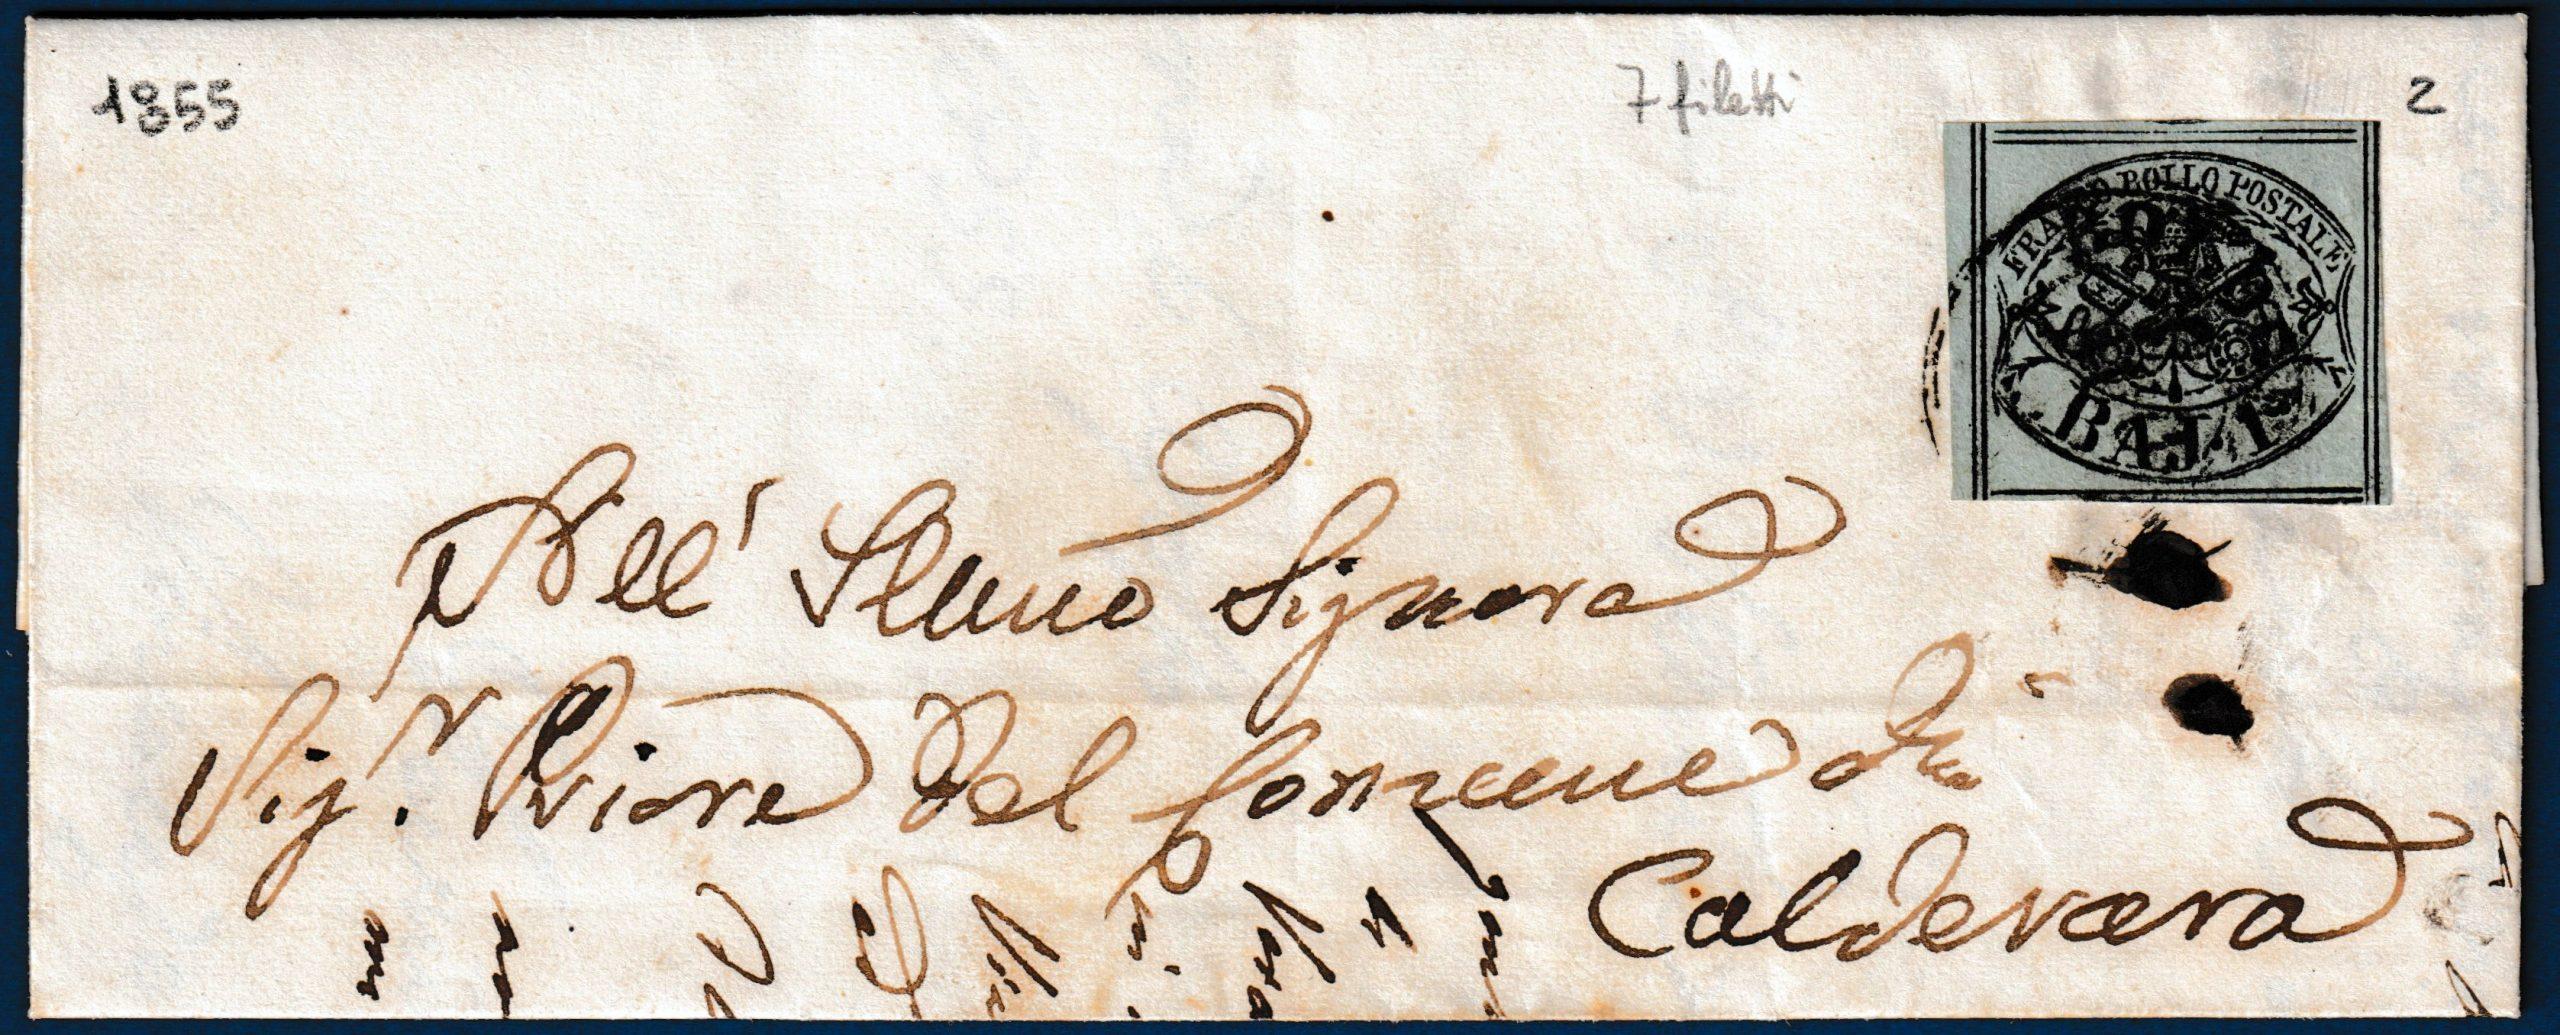 1855 - Pontificio lettera affrancata